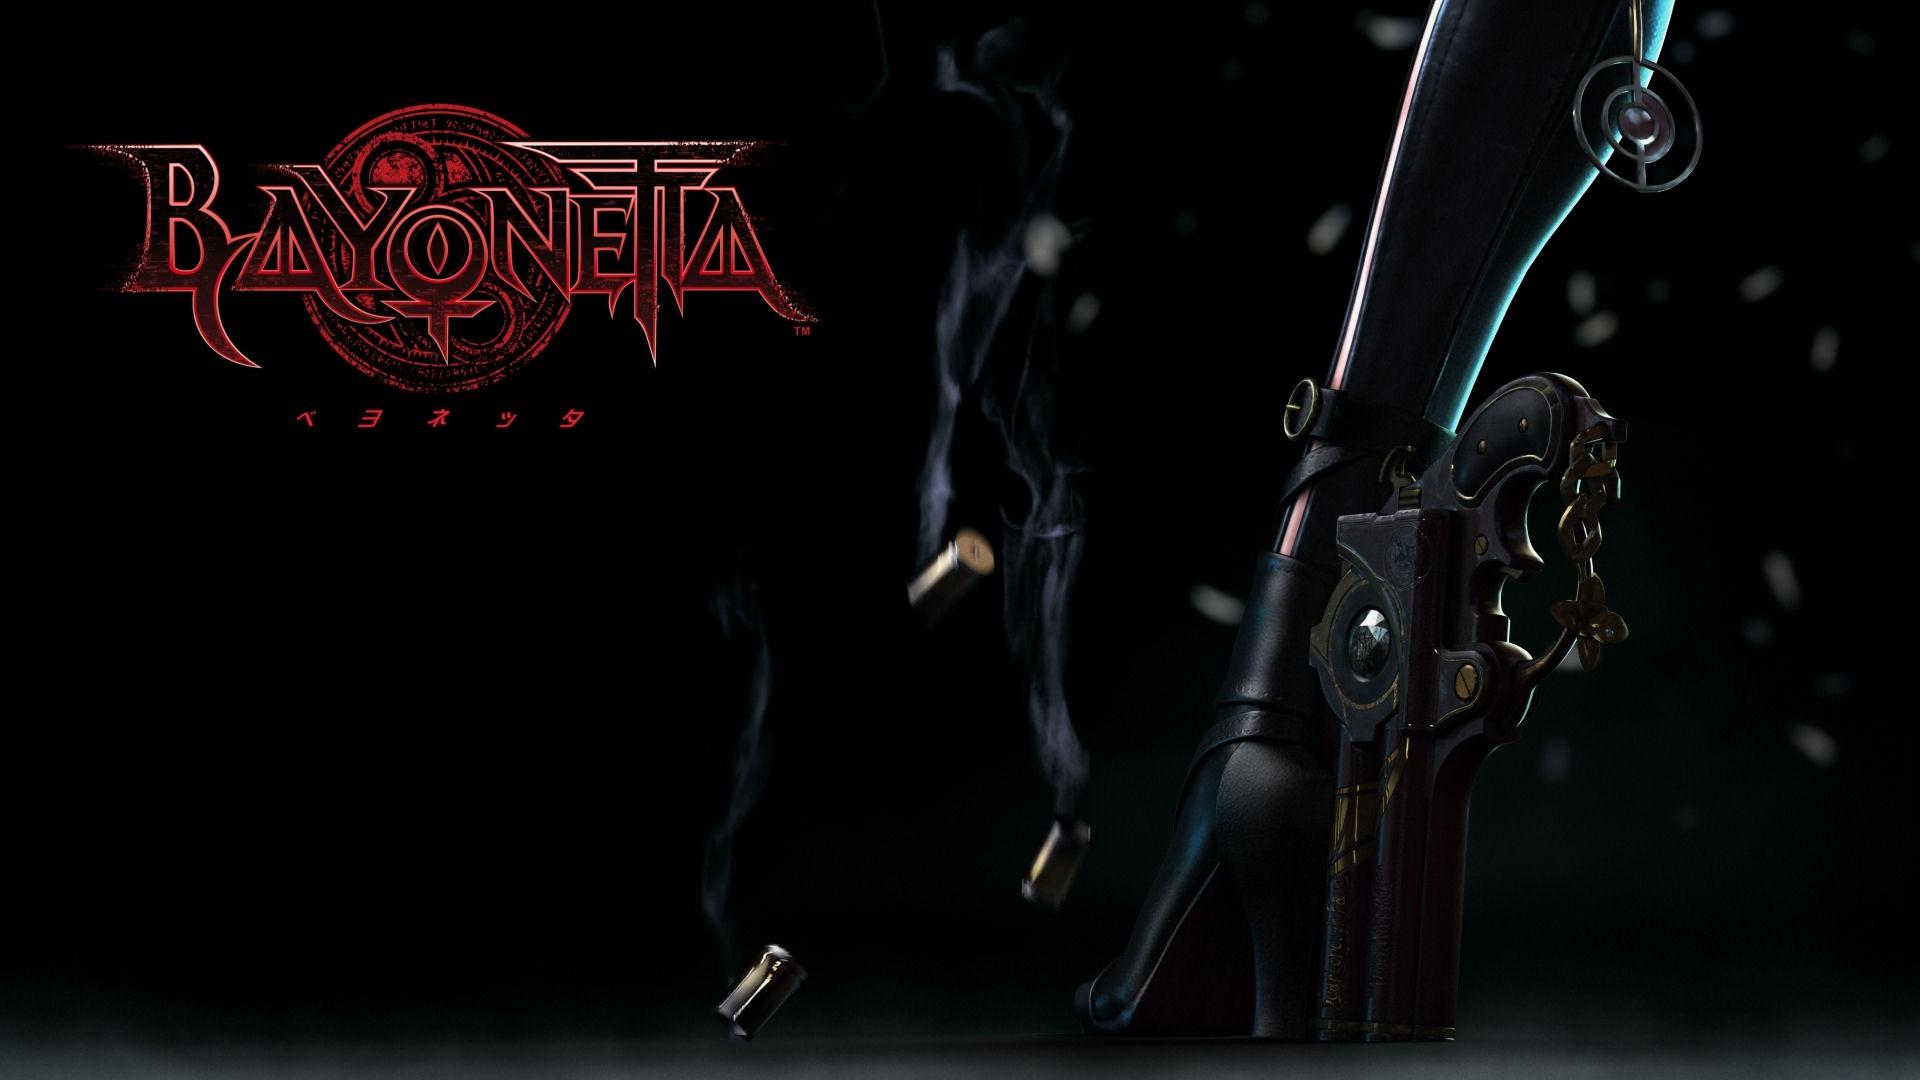 Bayonetta Desktop Background.